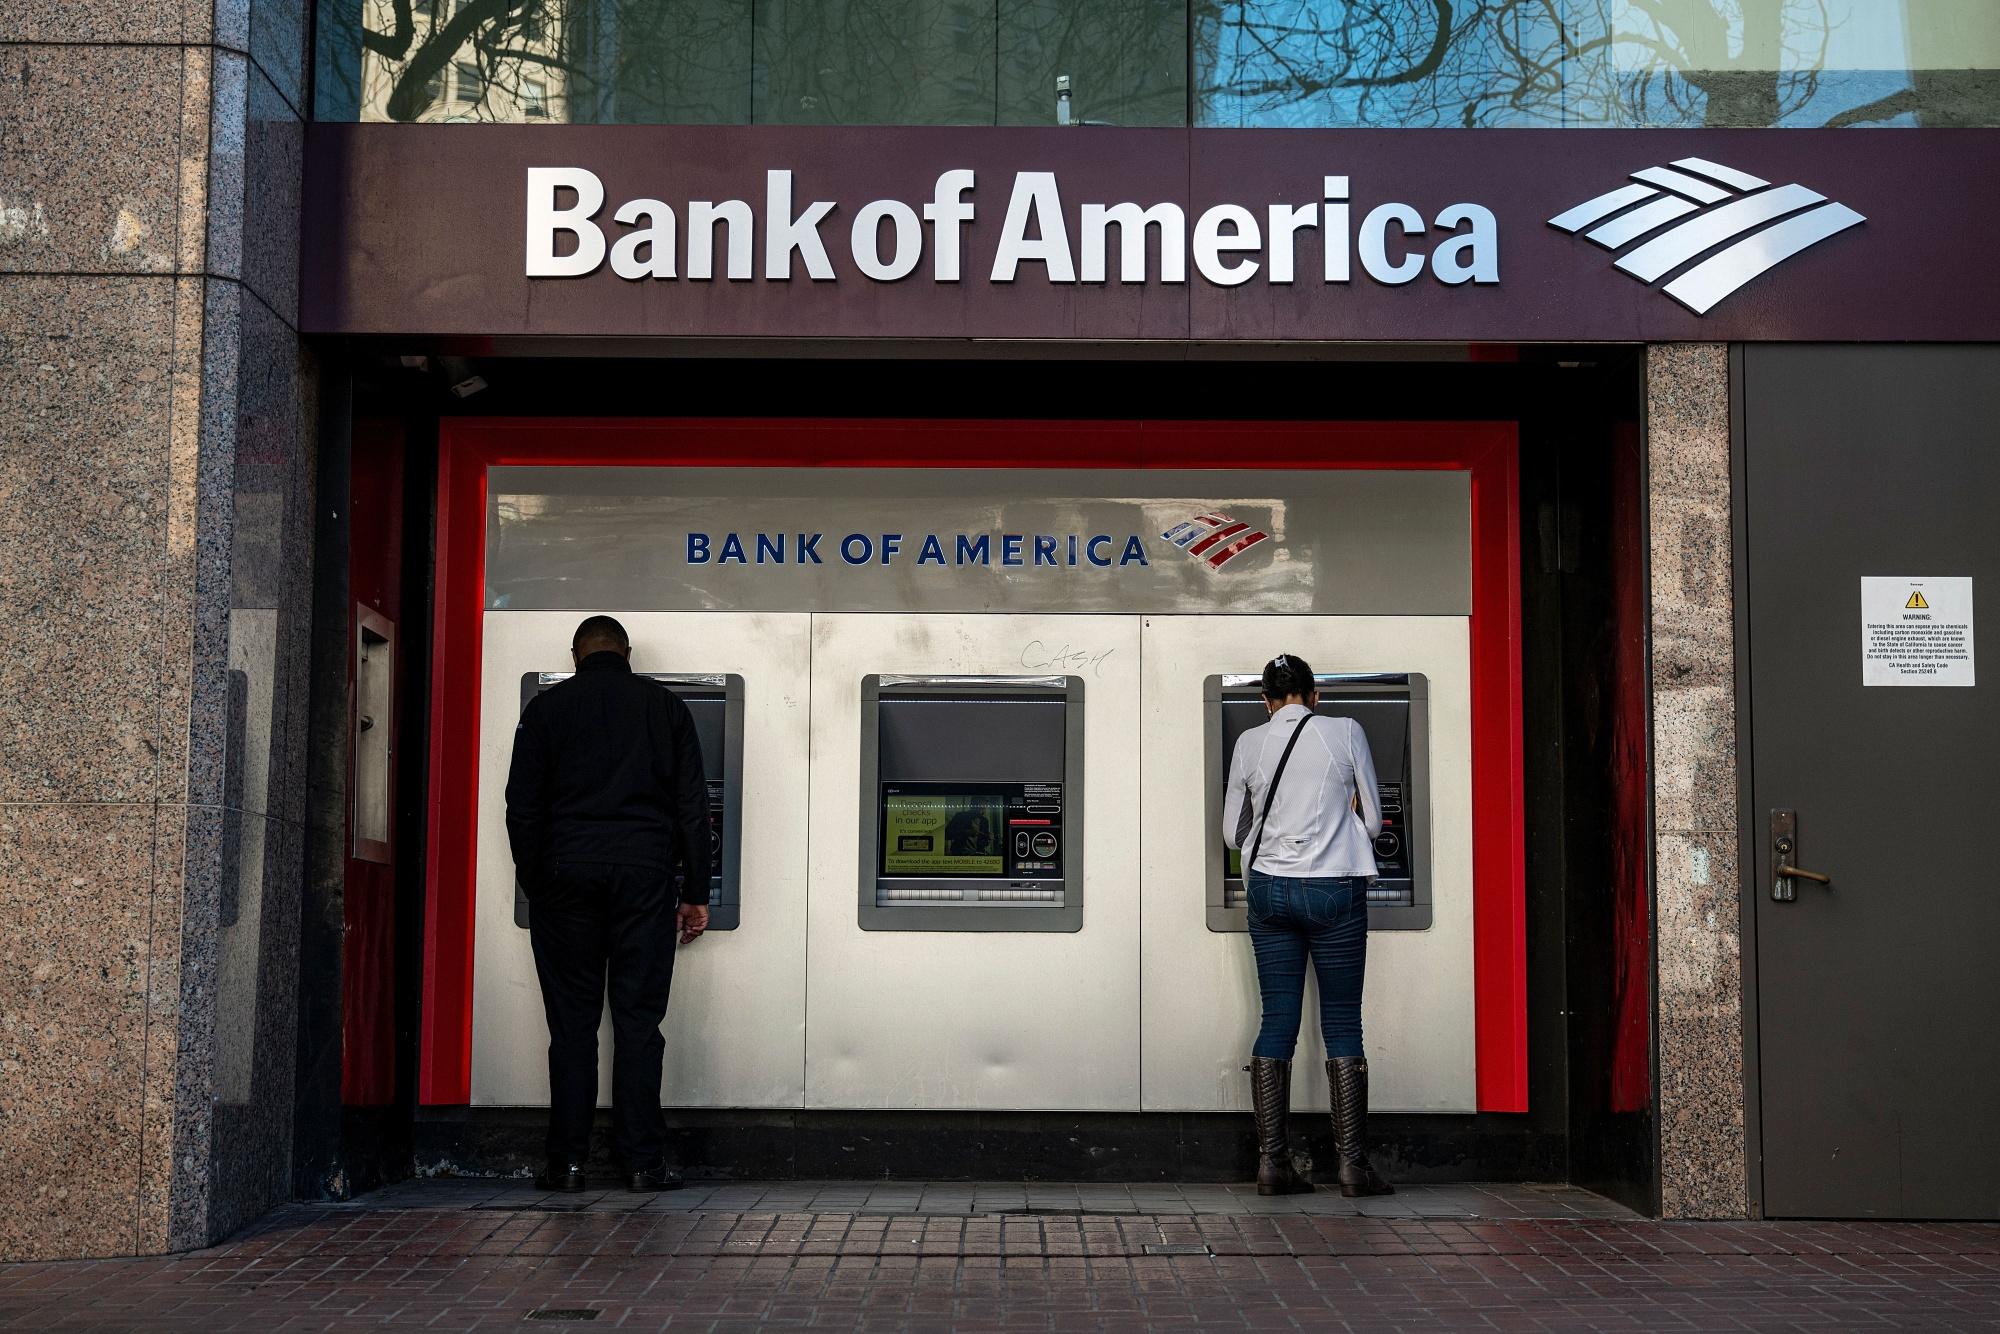 Bank of America Names Managing Directors With Diversity Push - Bloomberg